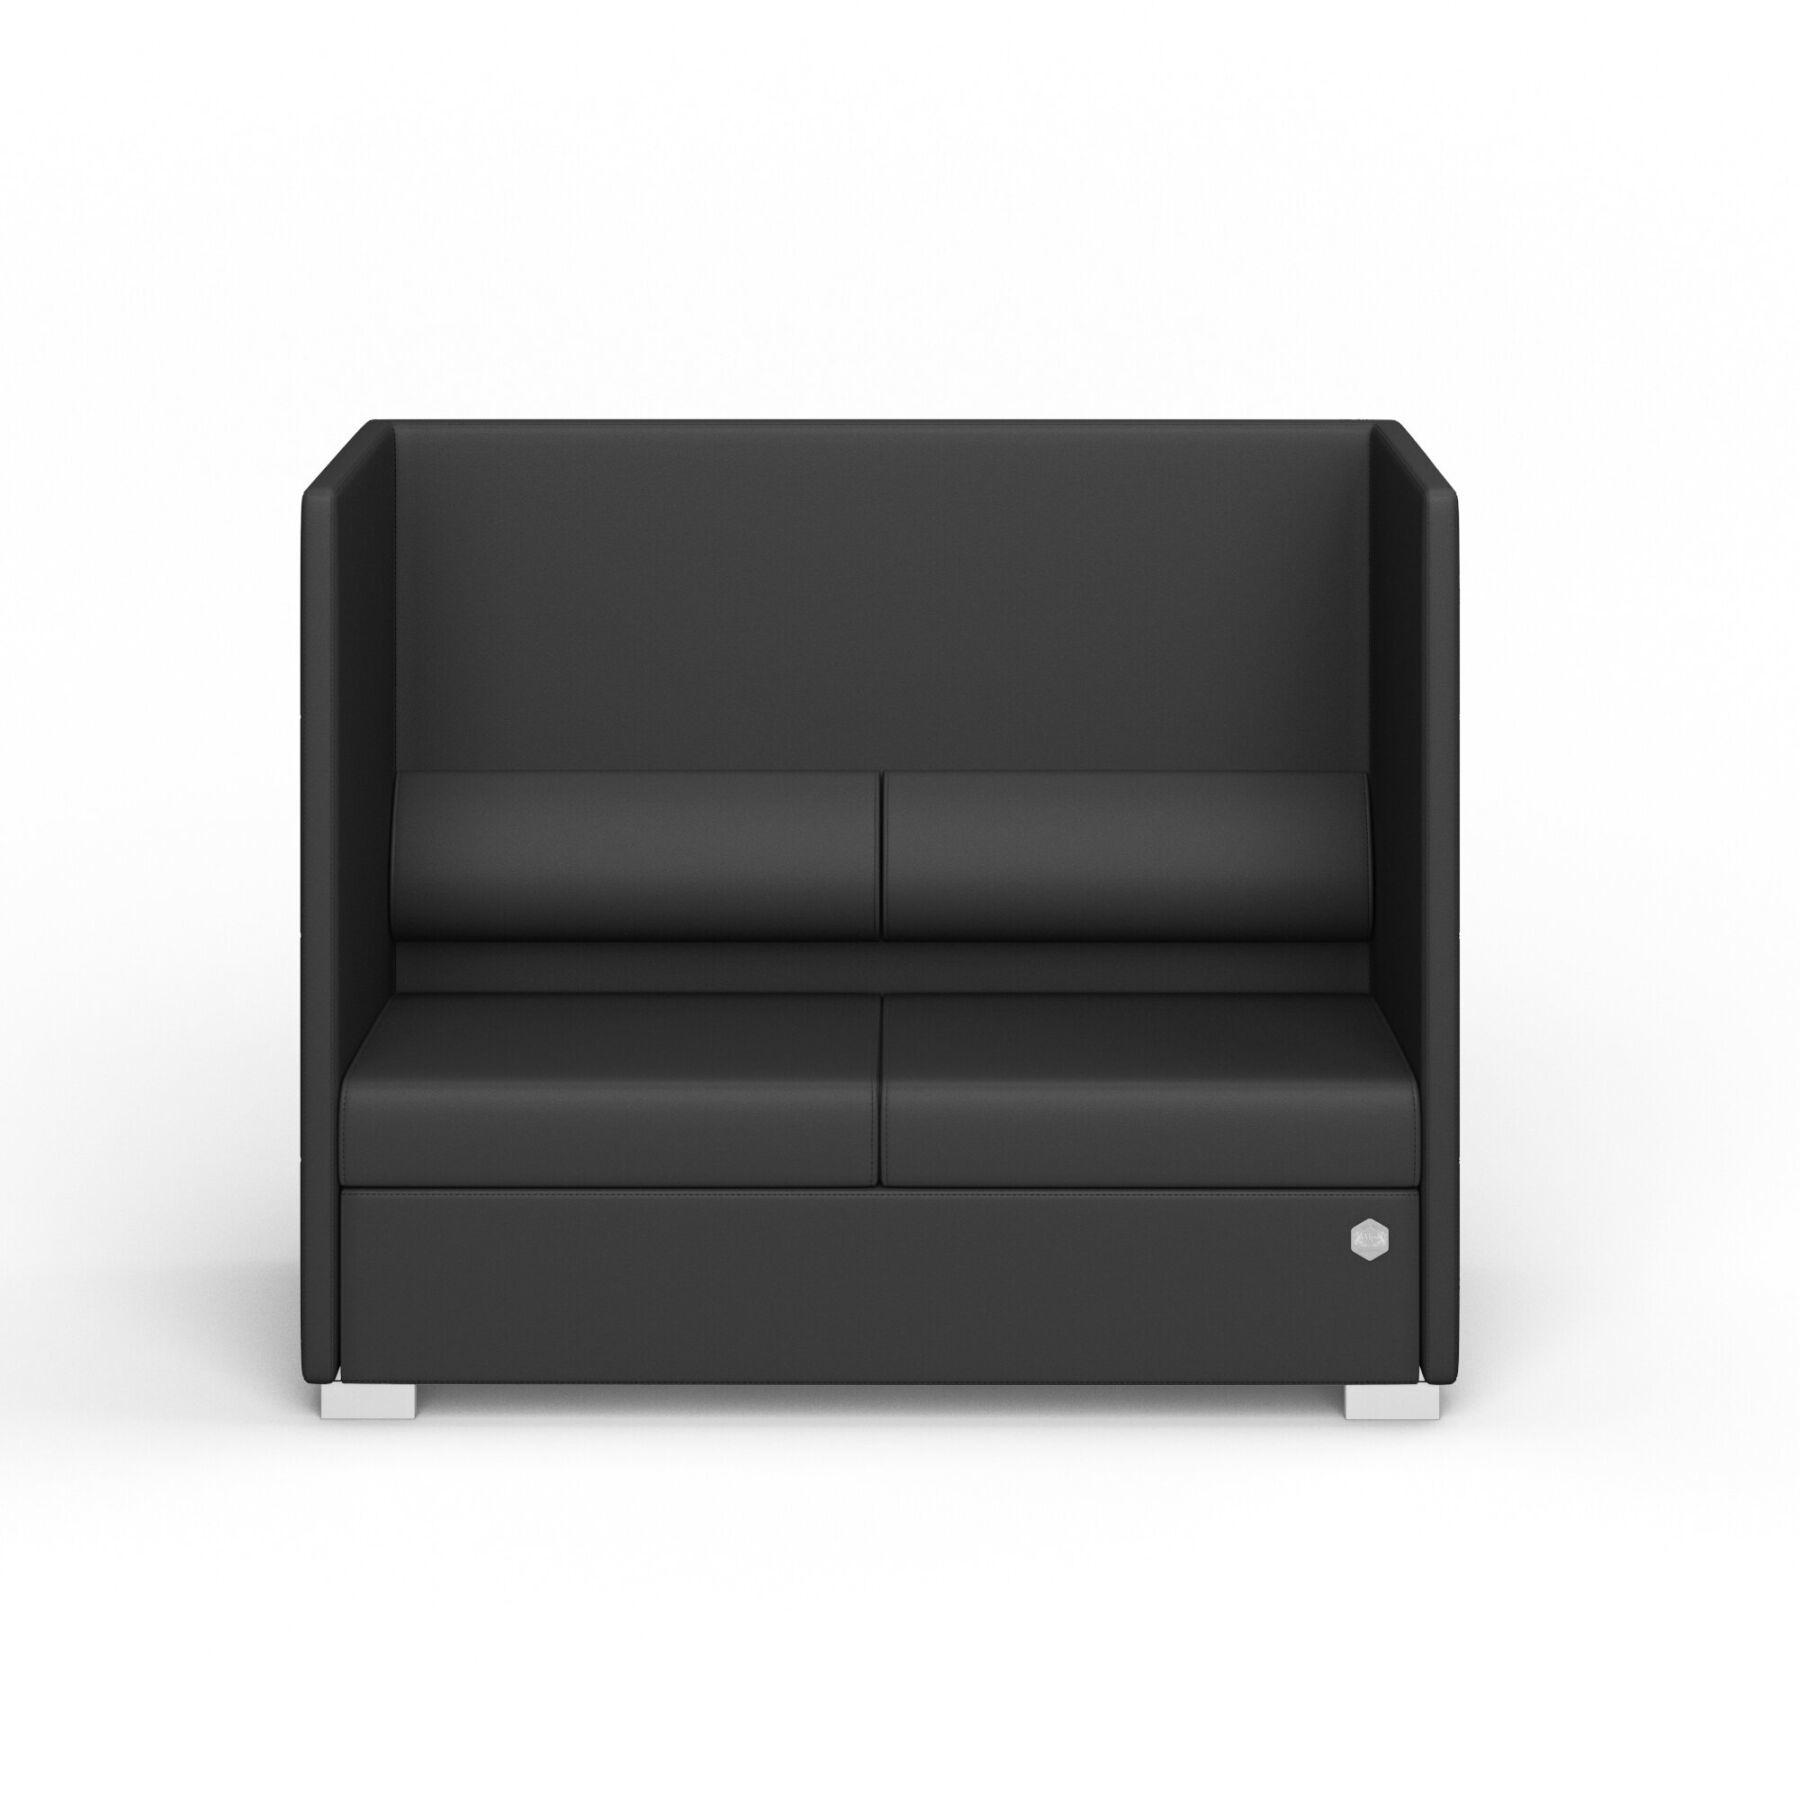 Двухместный диван KULIK SYSTEM PRIVATE Экокожа 2